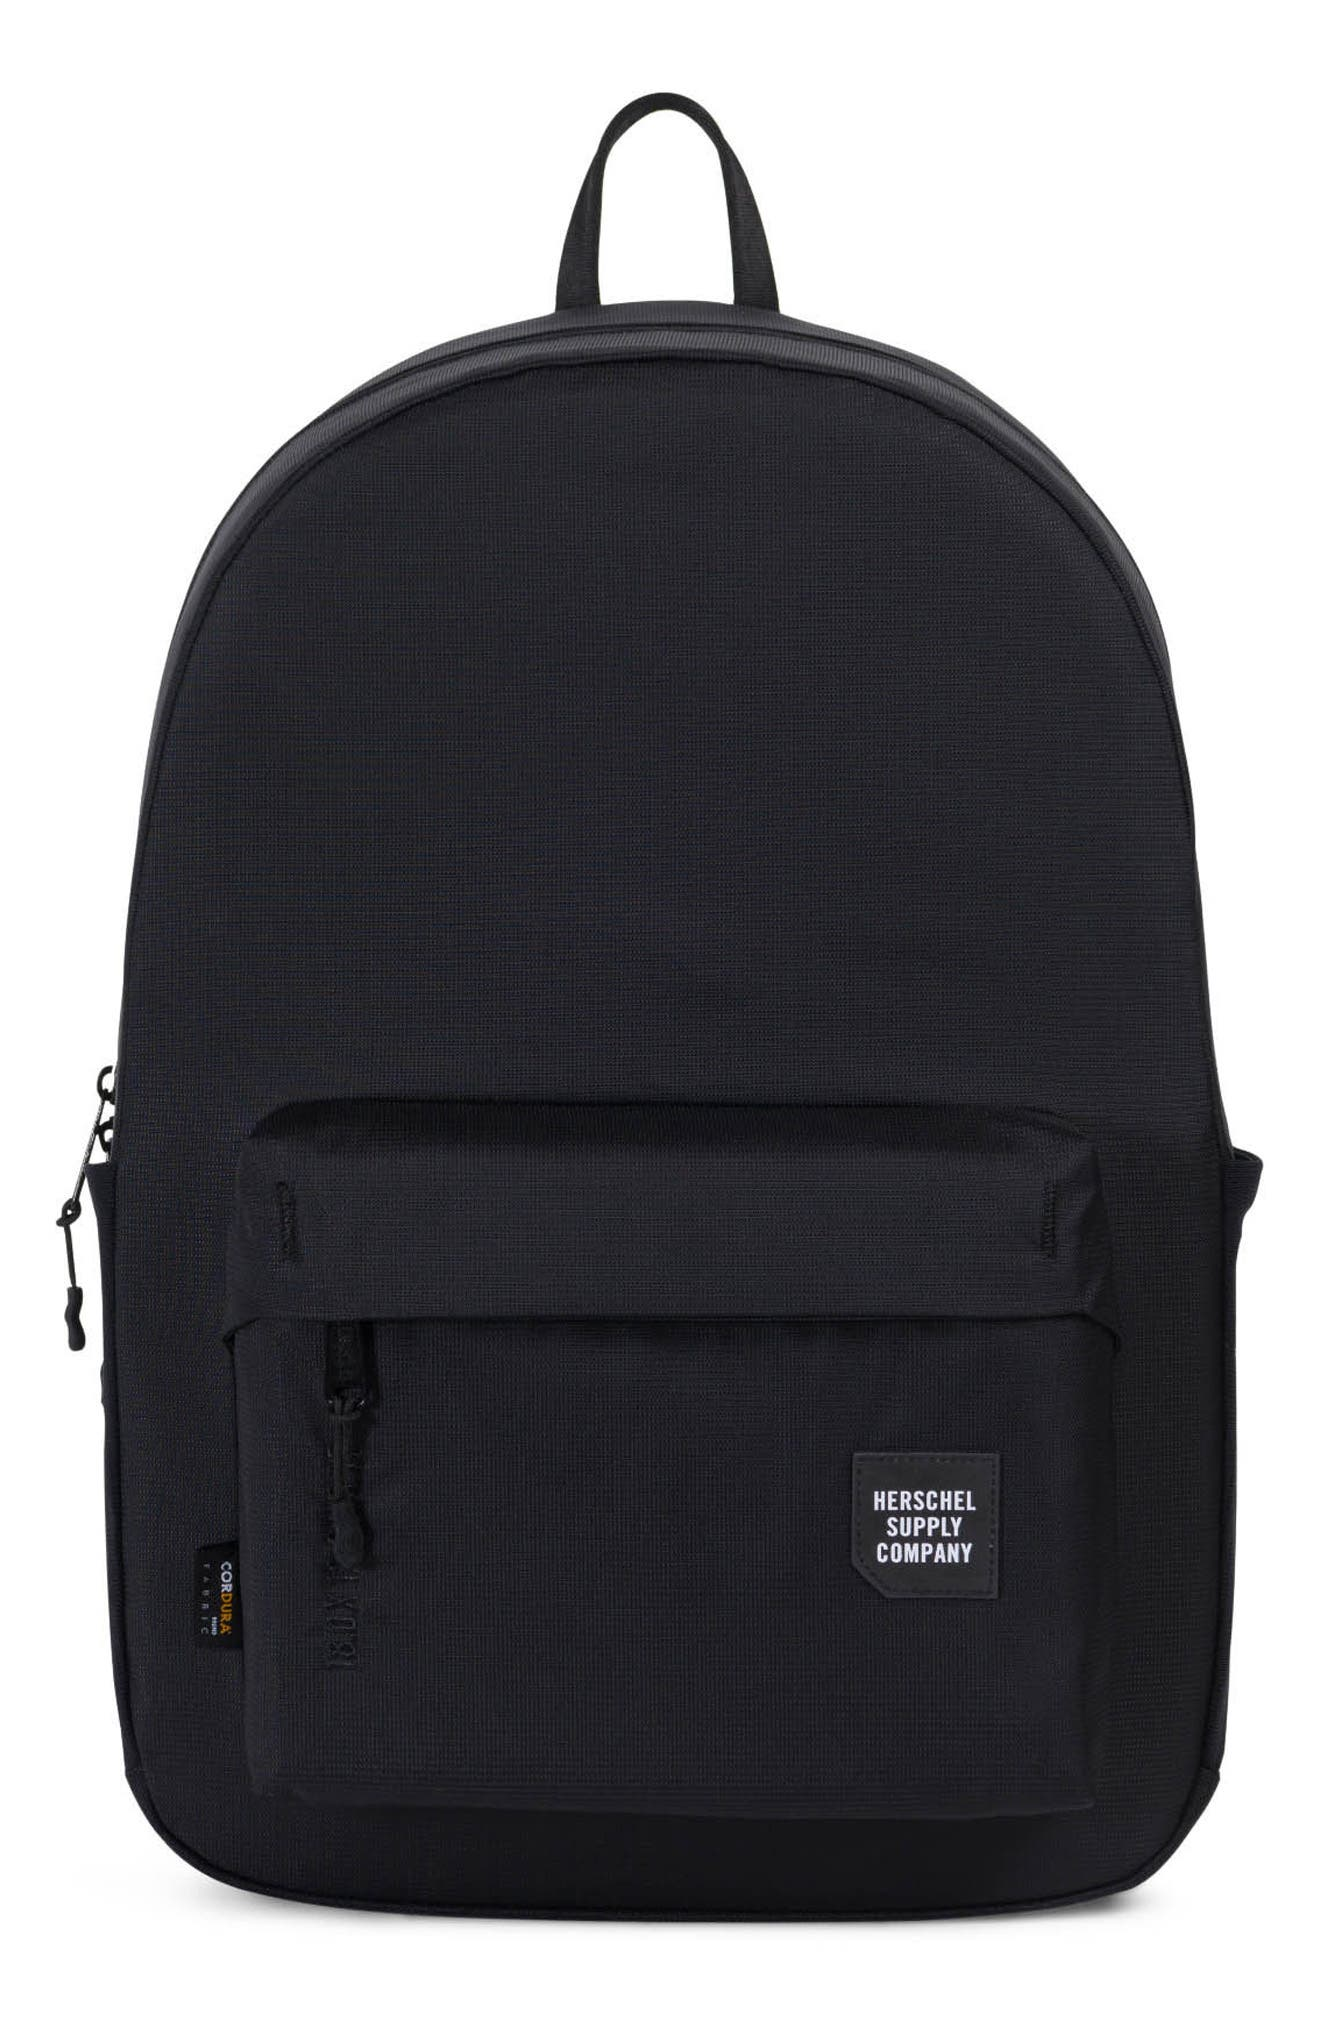 Rundle Trail Backpack,                             Main thumbnail 1, color,                             Black